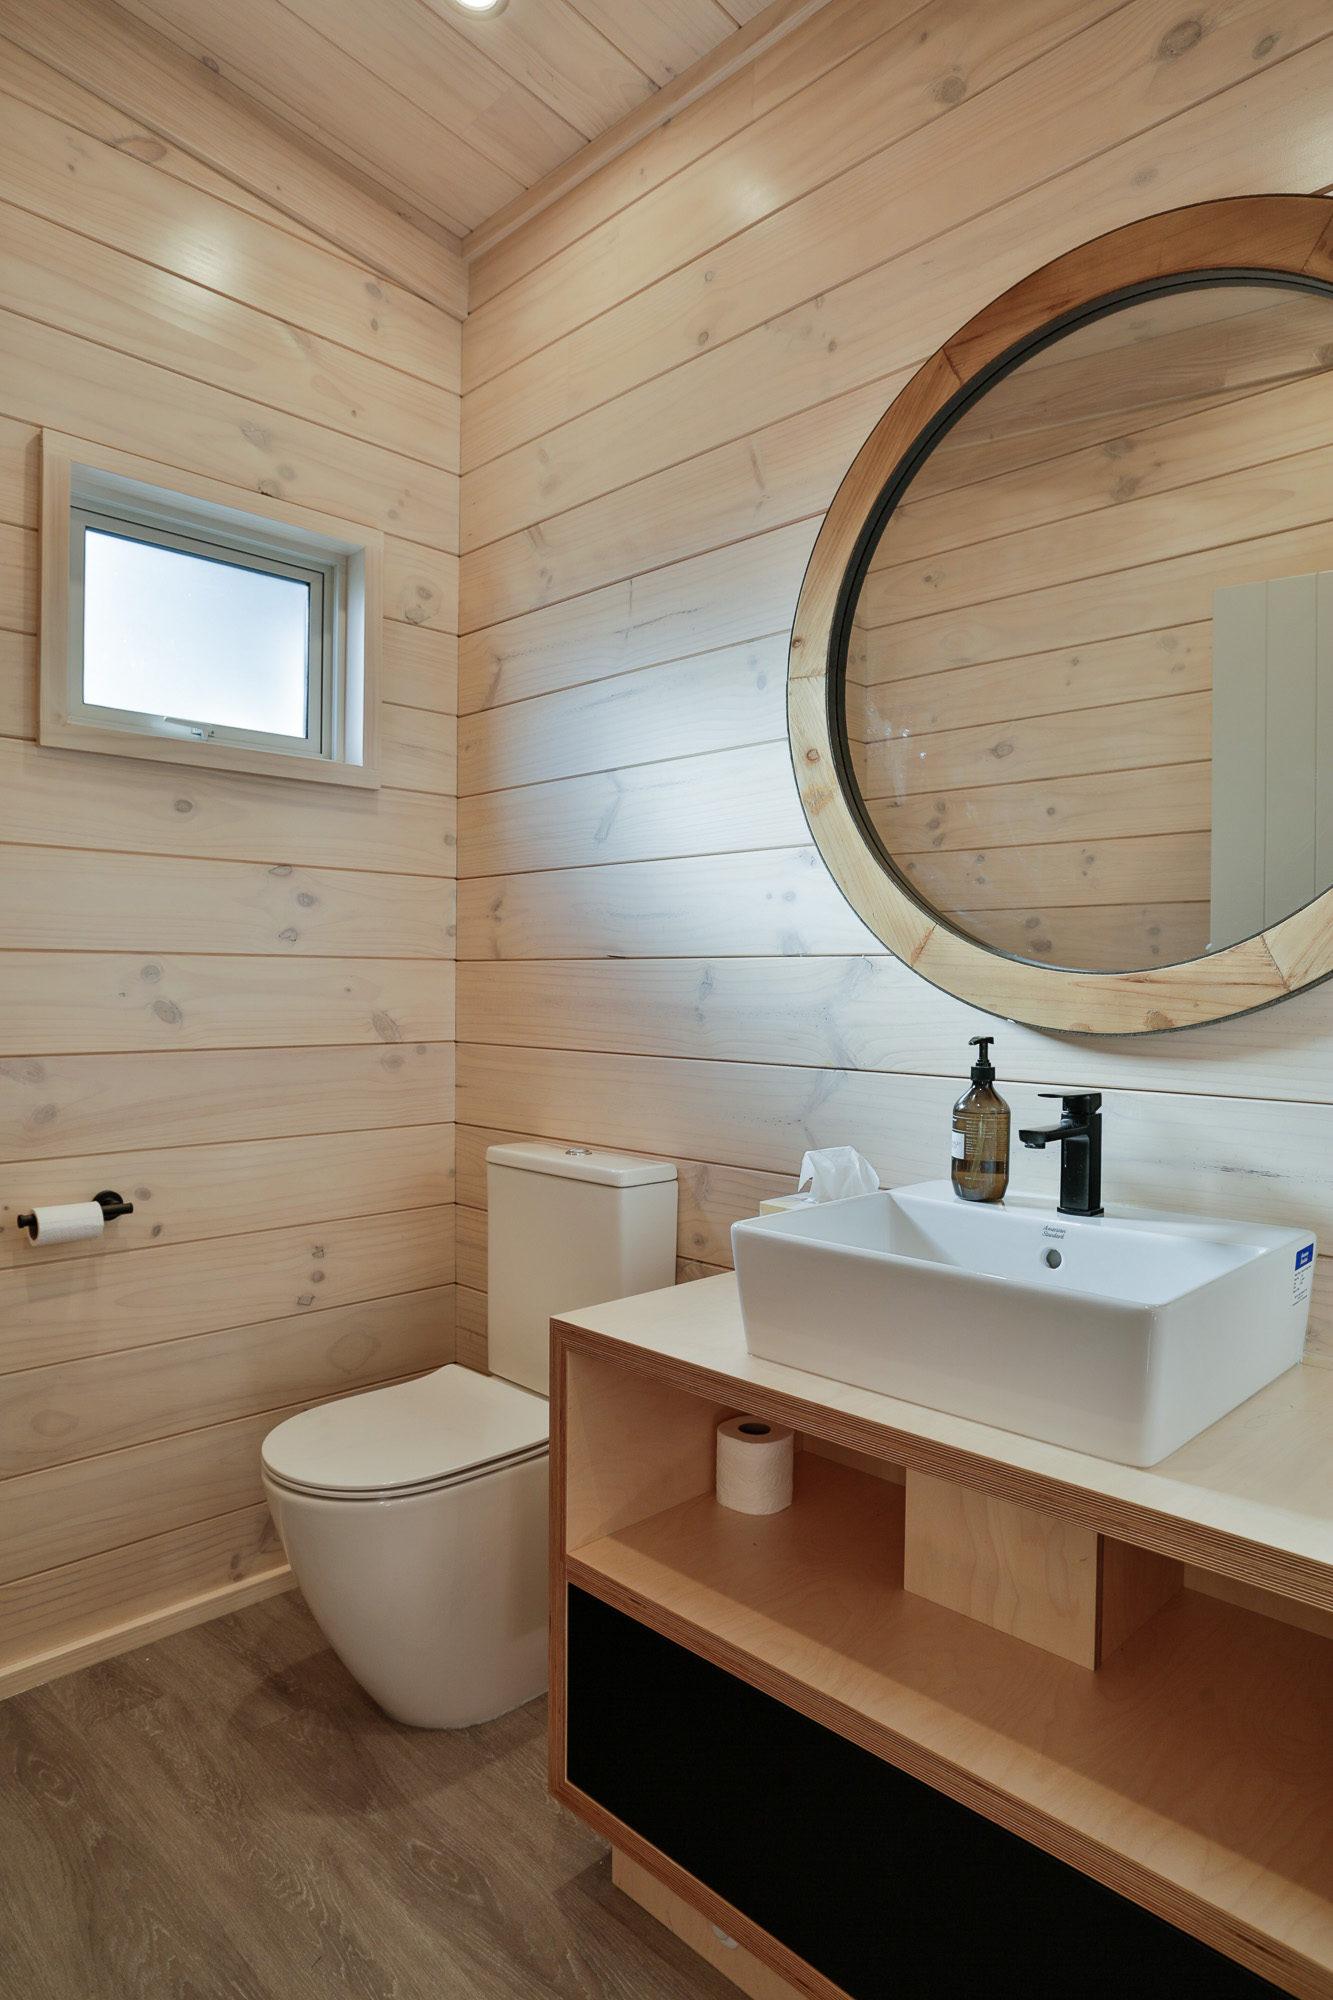 Lockwood home in the Coromandel handmade vanity with basin on top